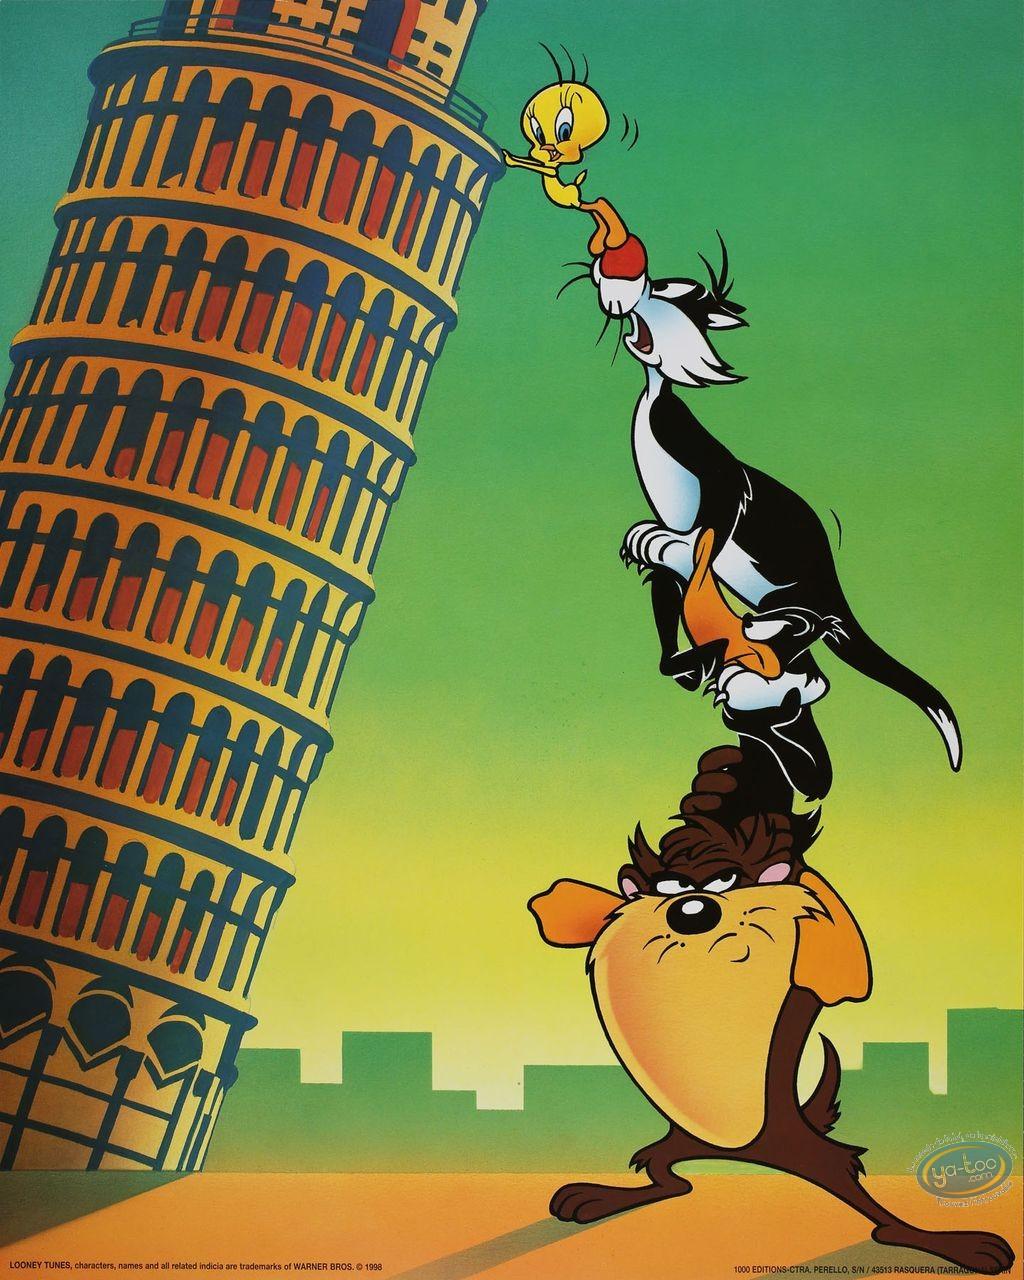 Offset Print, Looney Tunes (Les) : Italian Hollyday 50X40 cm